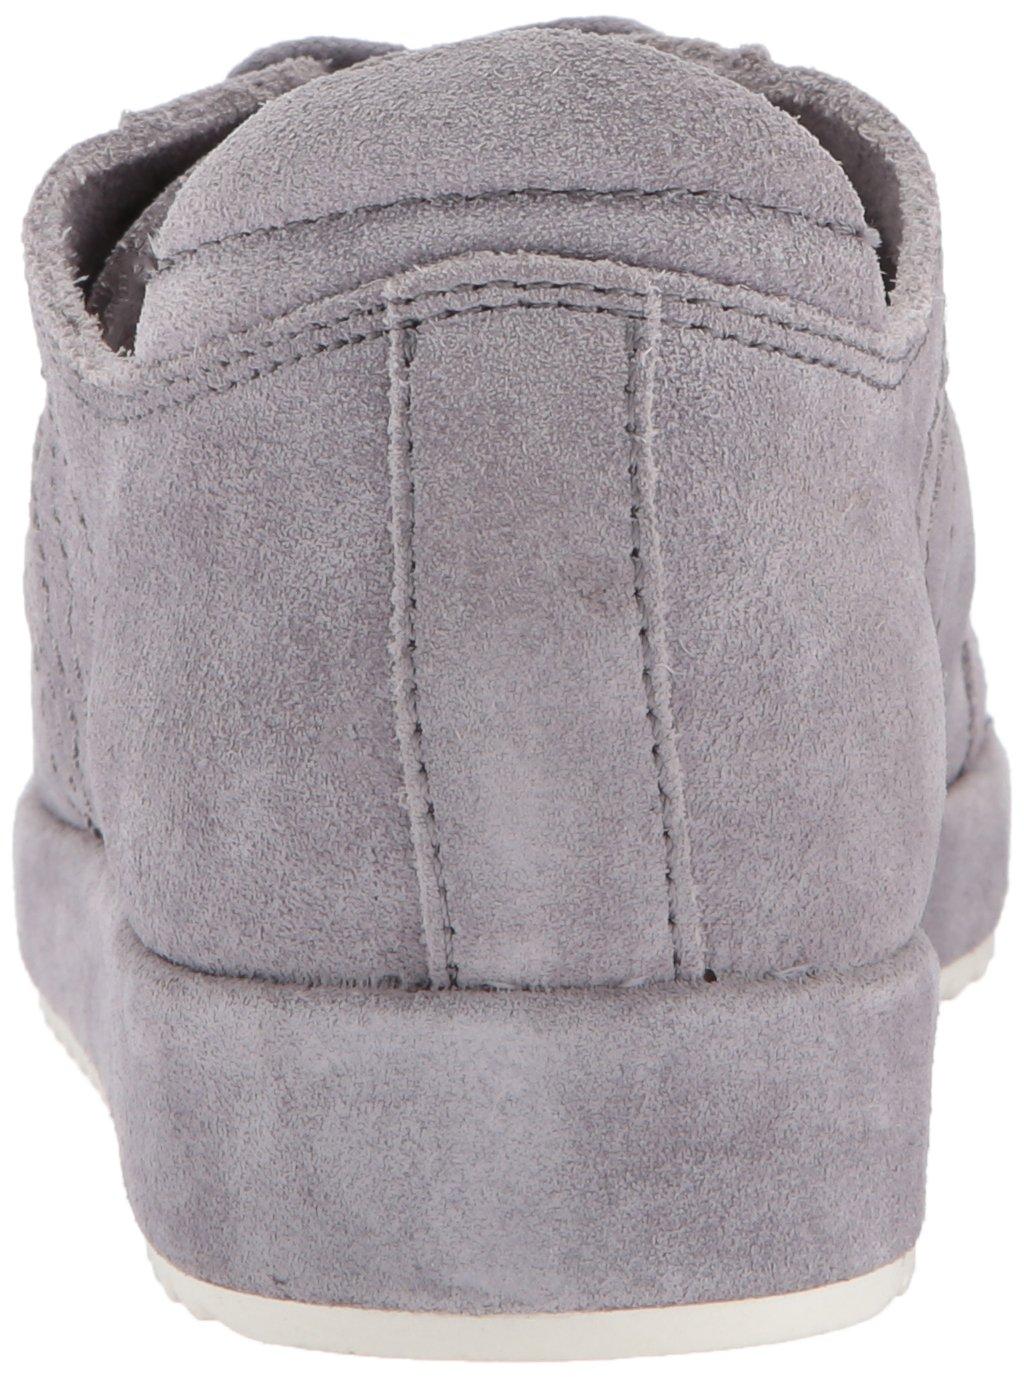 Dolce Vita Women's Sage Sneaker B072QD236J 10 B(M) US|Grey Suede